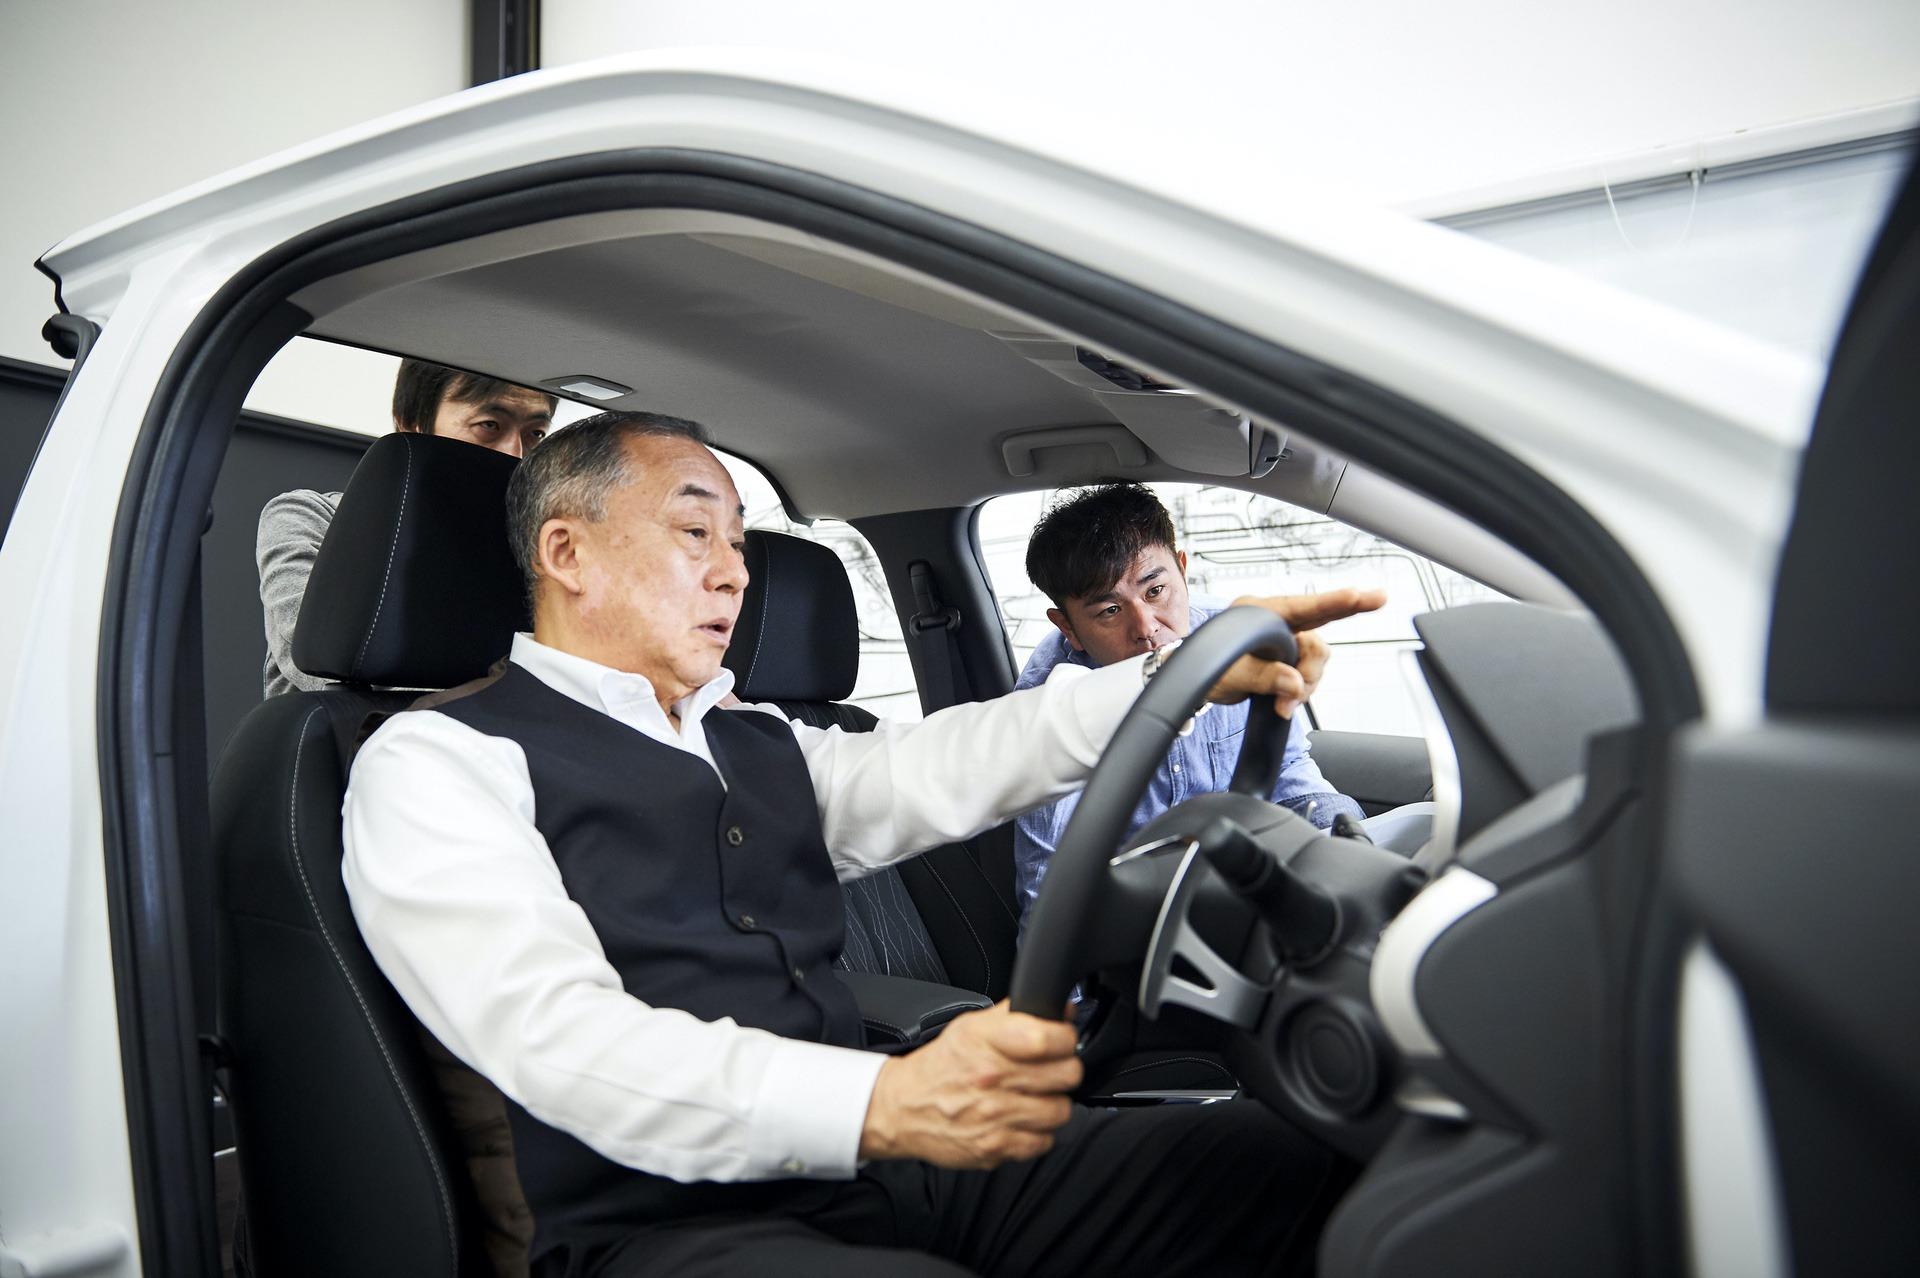 First_Drive_Mitsubishi_Eclipse_Cross_0113